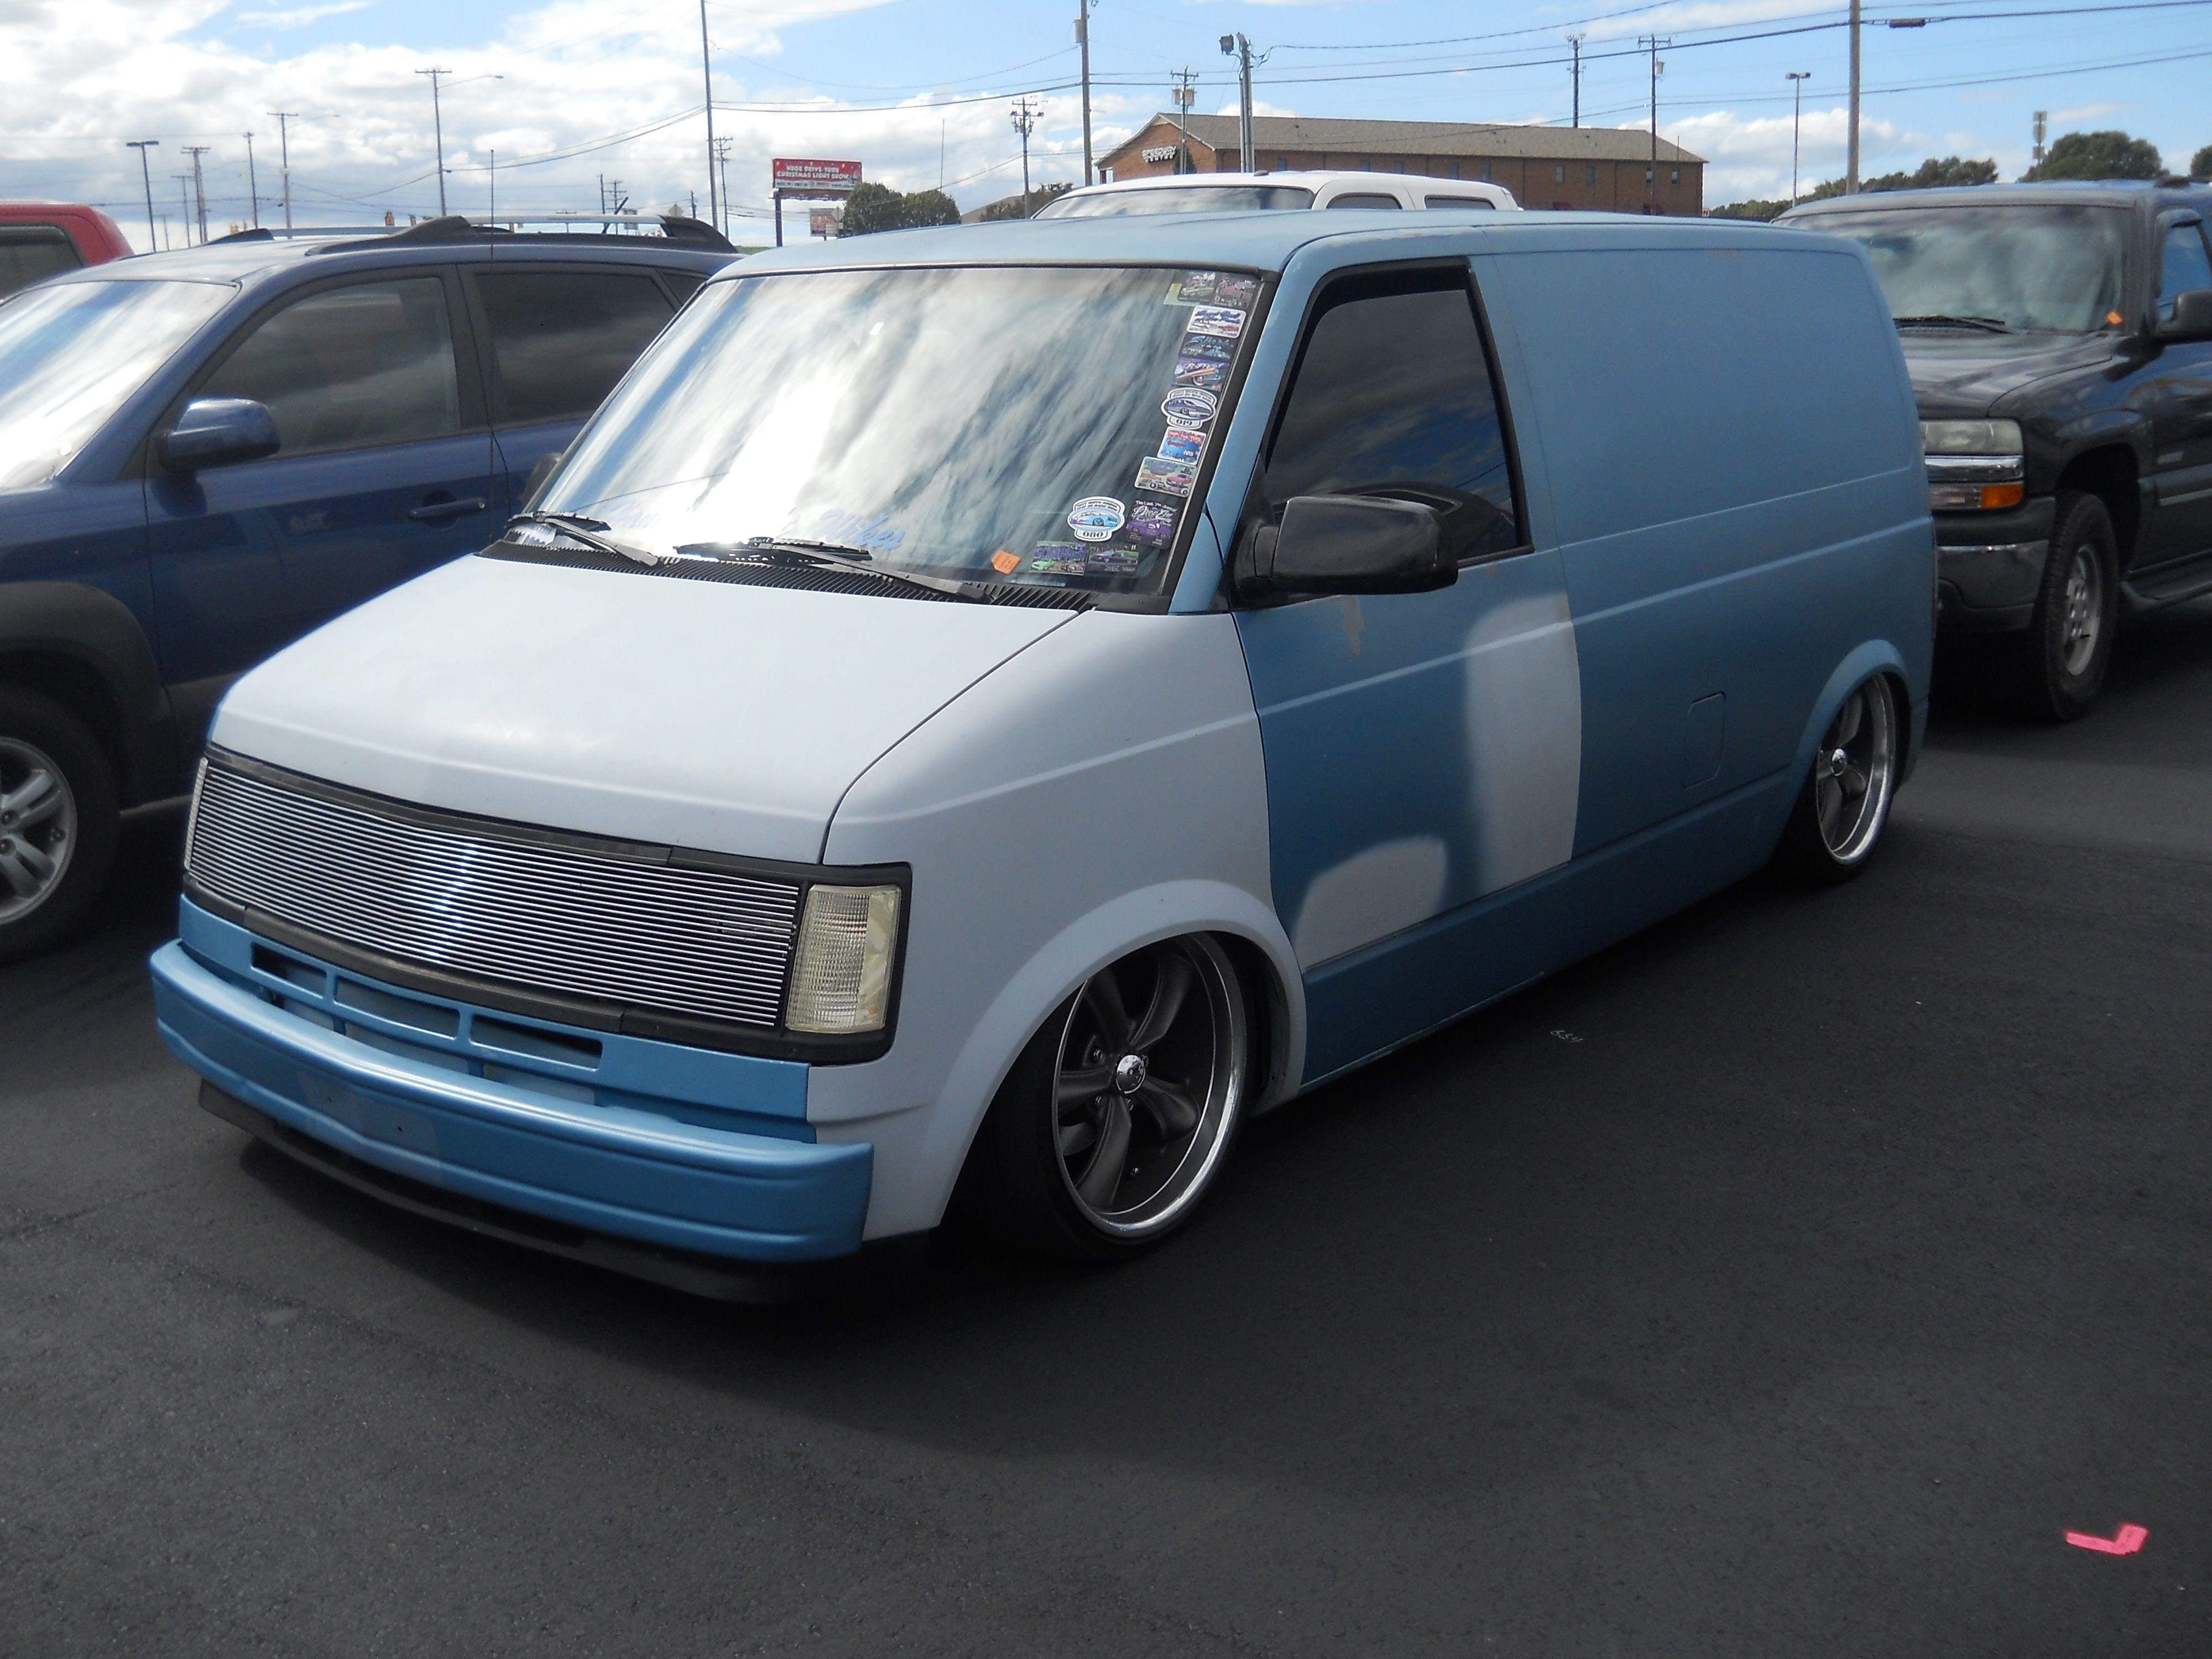 minivan used majeski il sterling sale for in gmc search motors